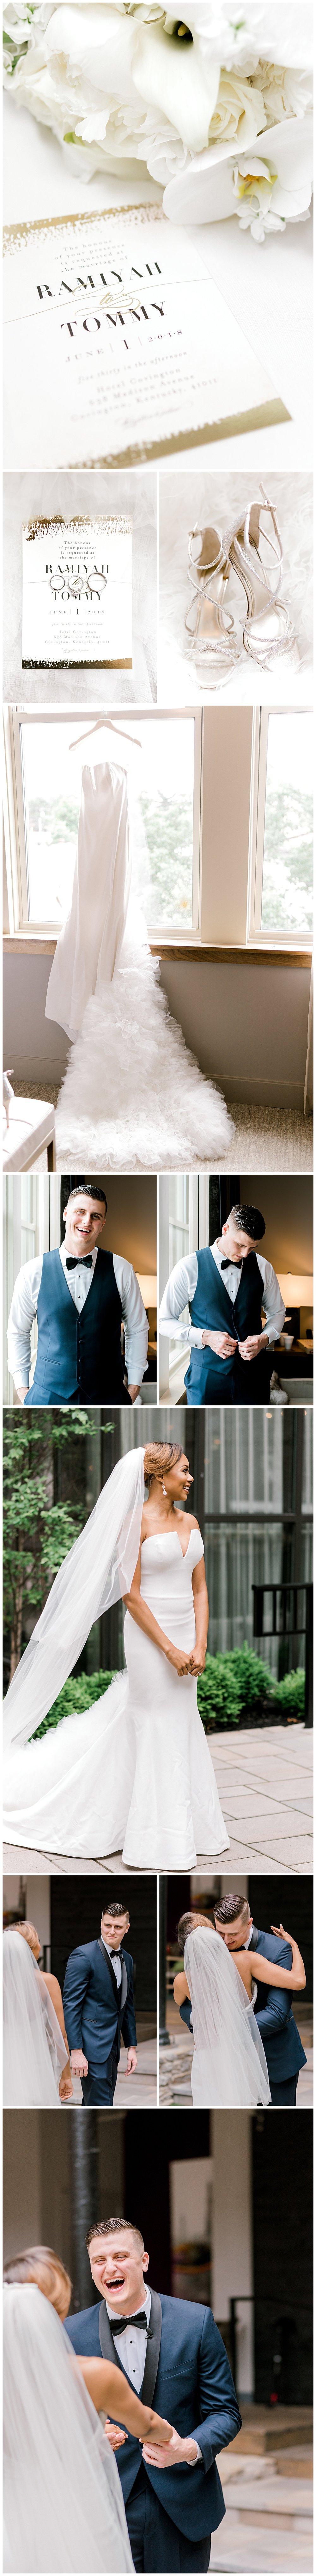 ramiyah and tommy's wedding hotel covington chapel lane photography